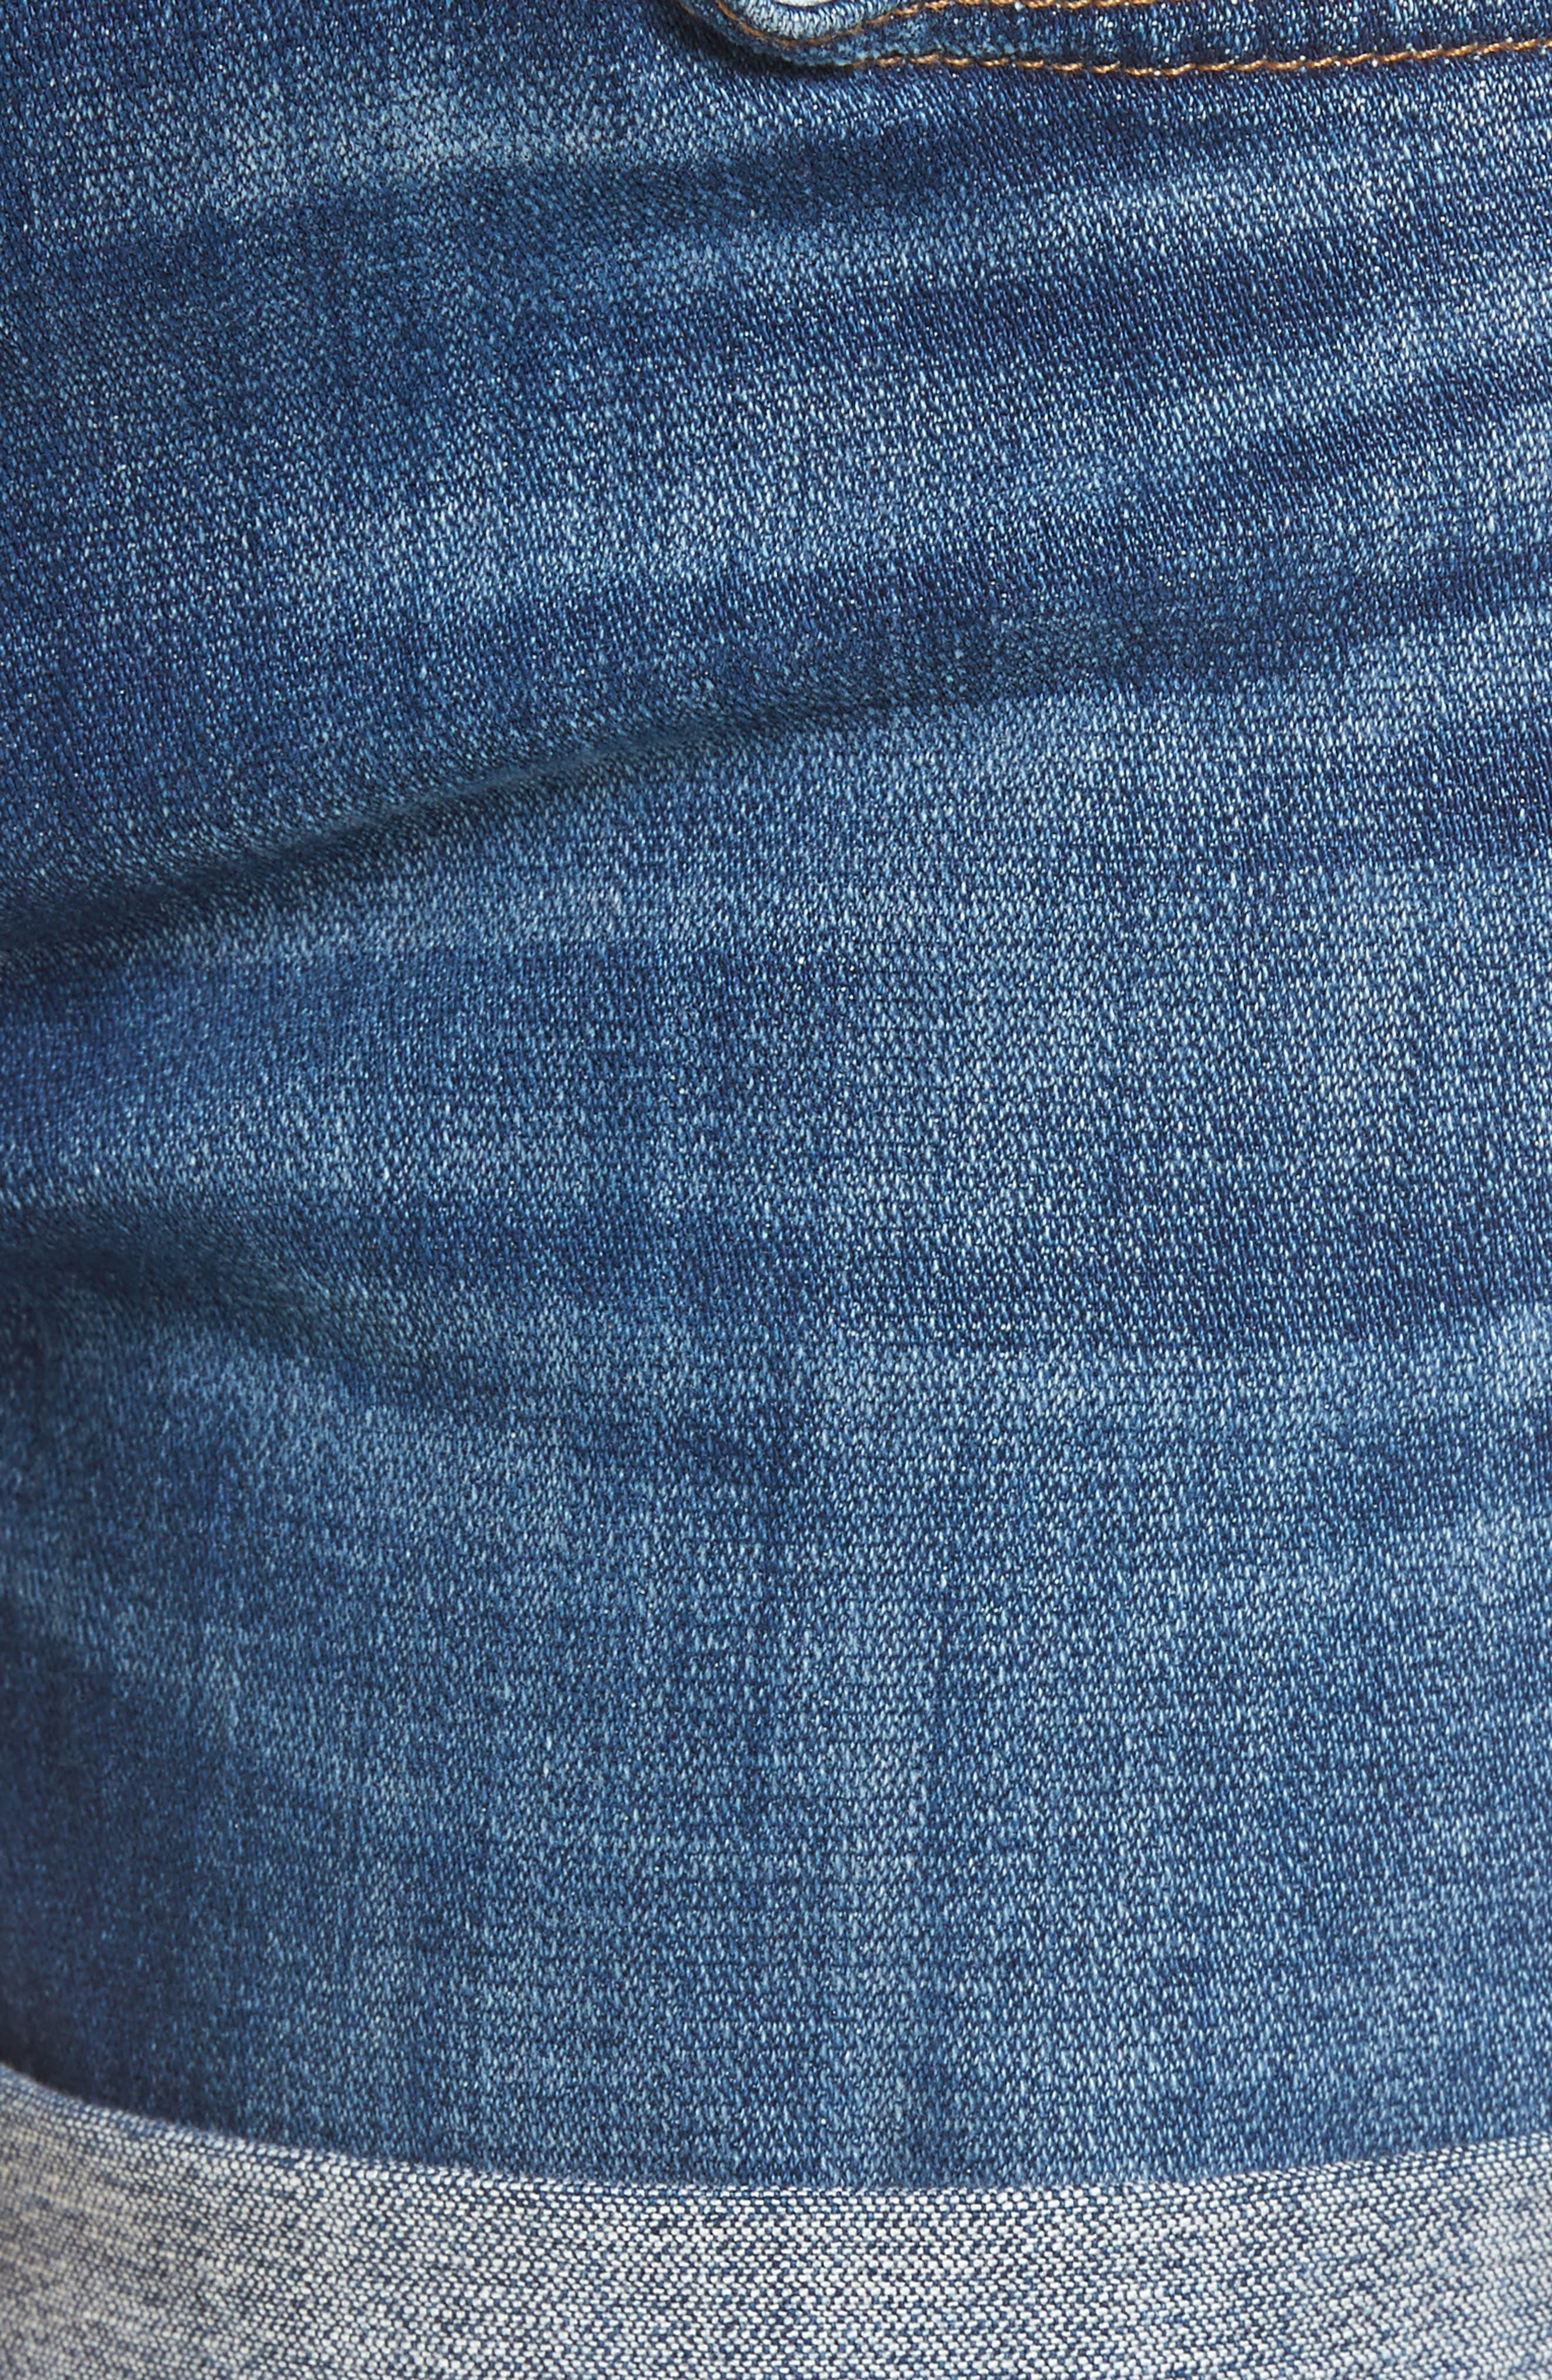 Roll Cuff Denim Shorts,                             Alternate thumbnail 6, color,                             400